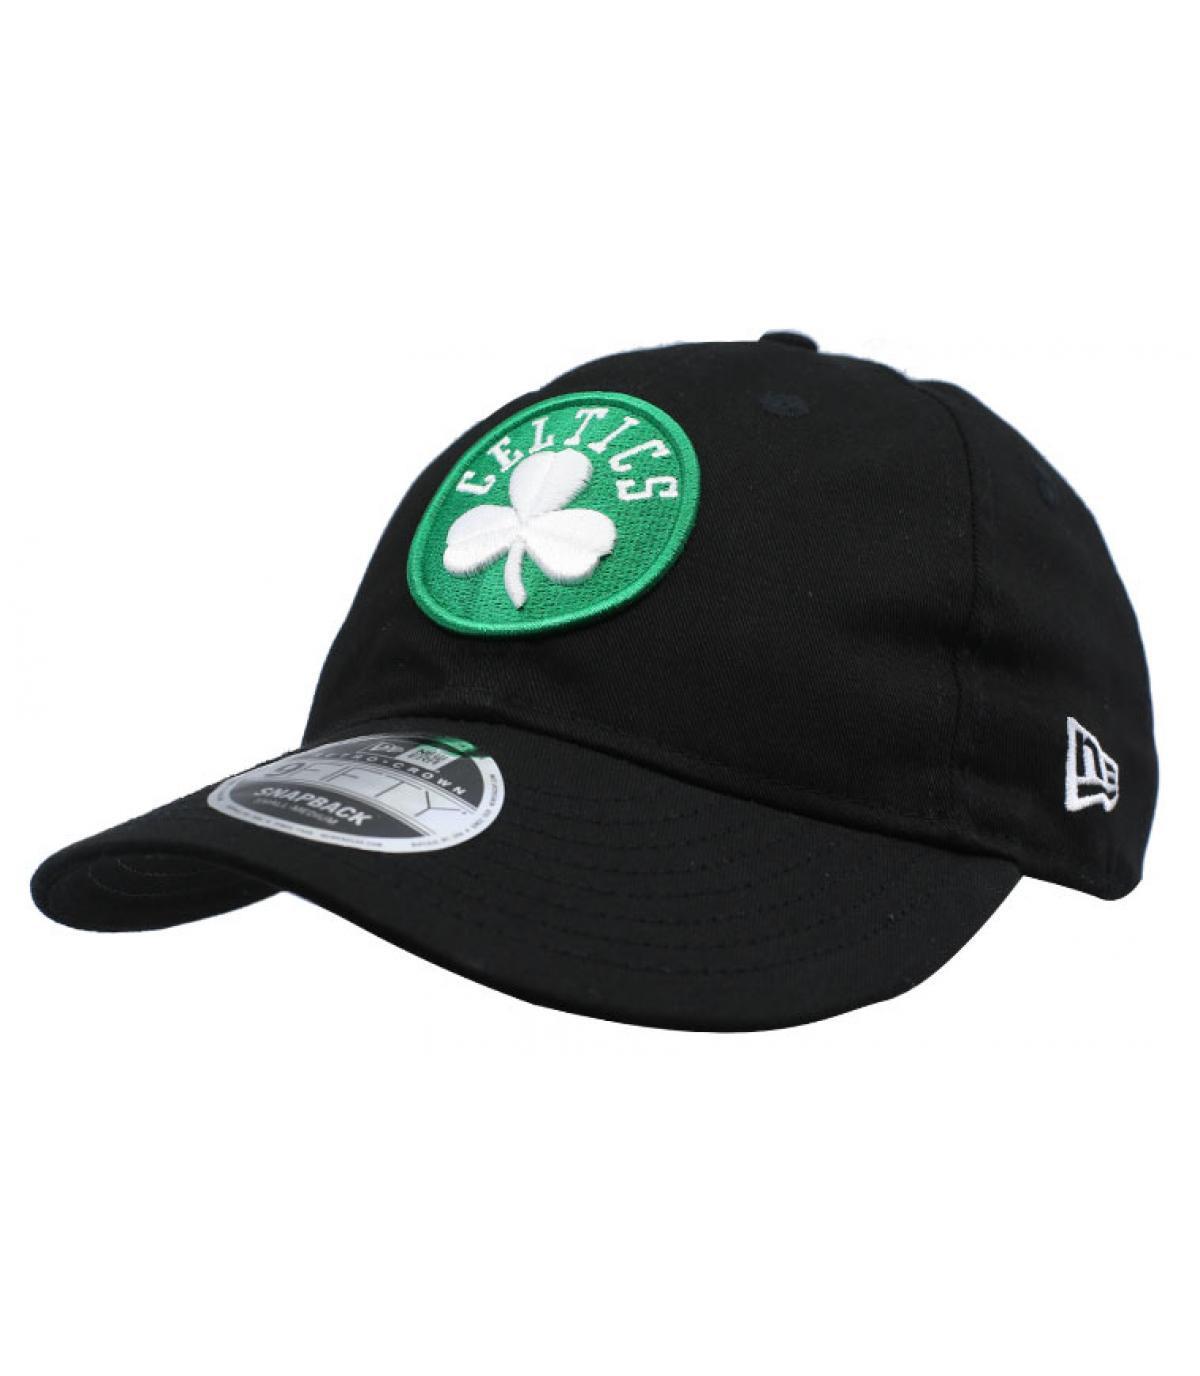 Details Snapback NBA Retro Crown 9Fifty Celtics - Abbildung 2